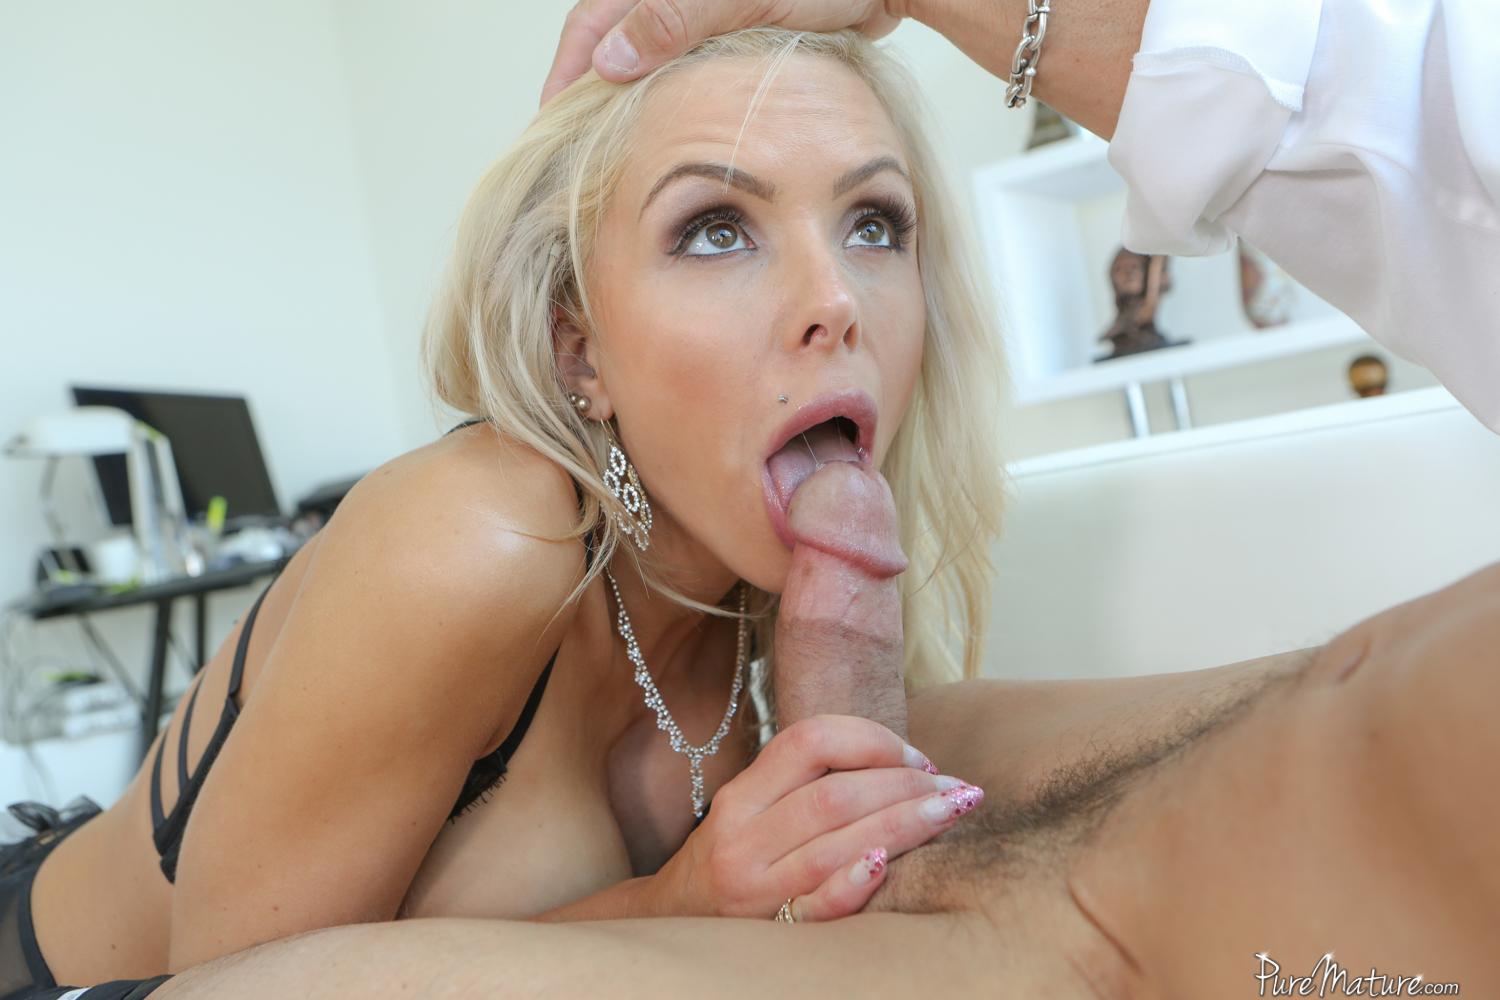 true blonde woman naked